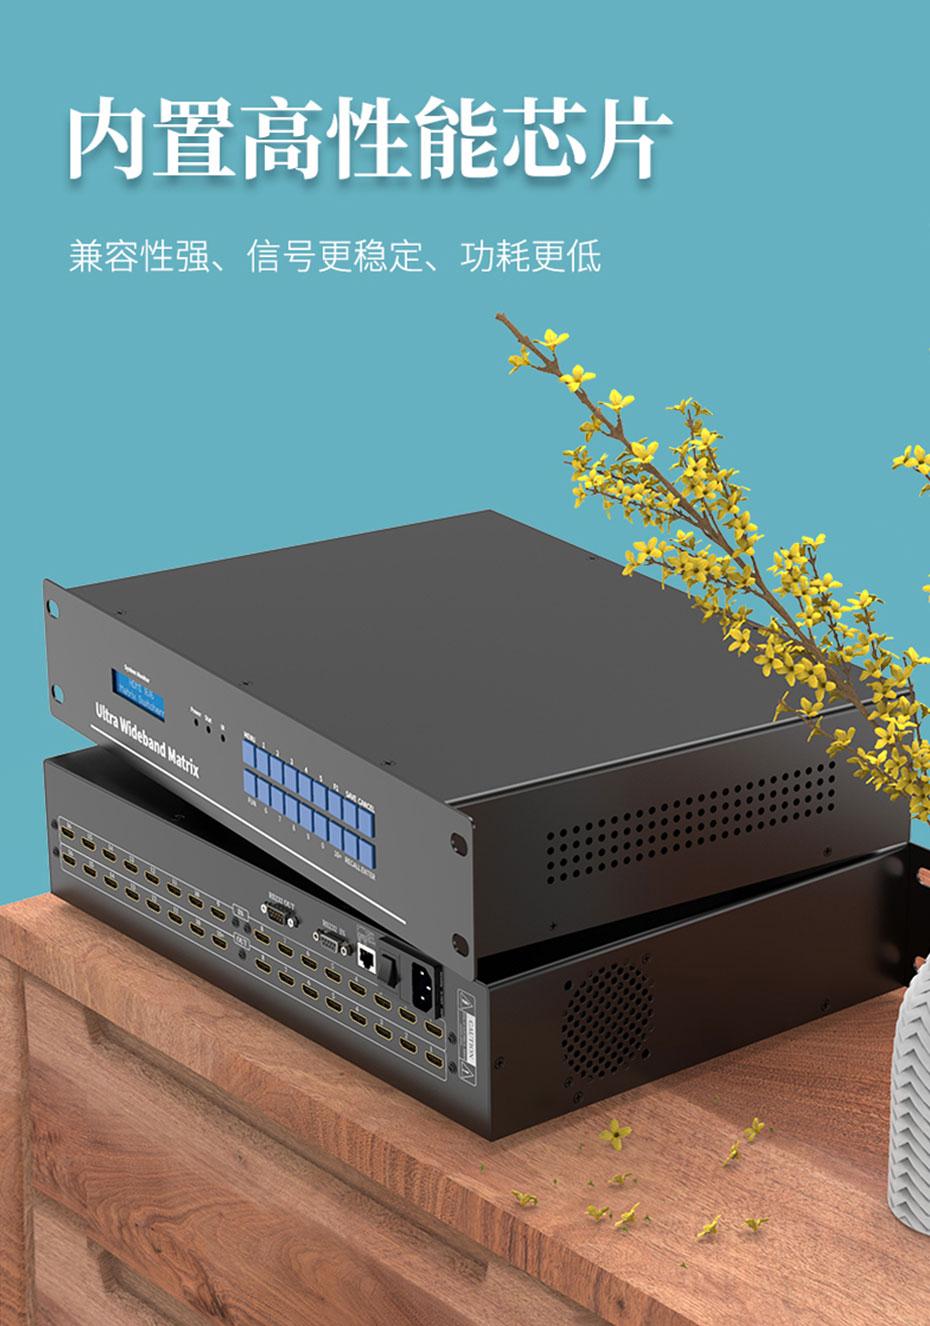 HDMI矩阵16进16出1616H内置高性能芯片,高兼容、低功耗、信号稳